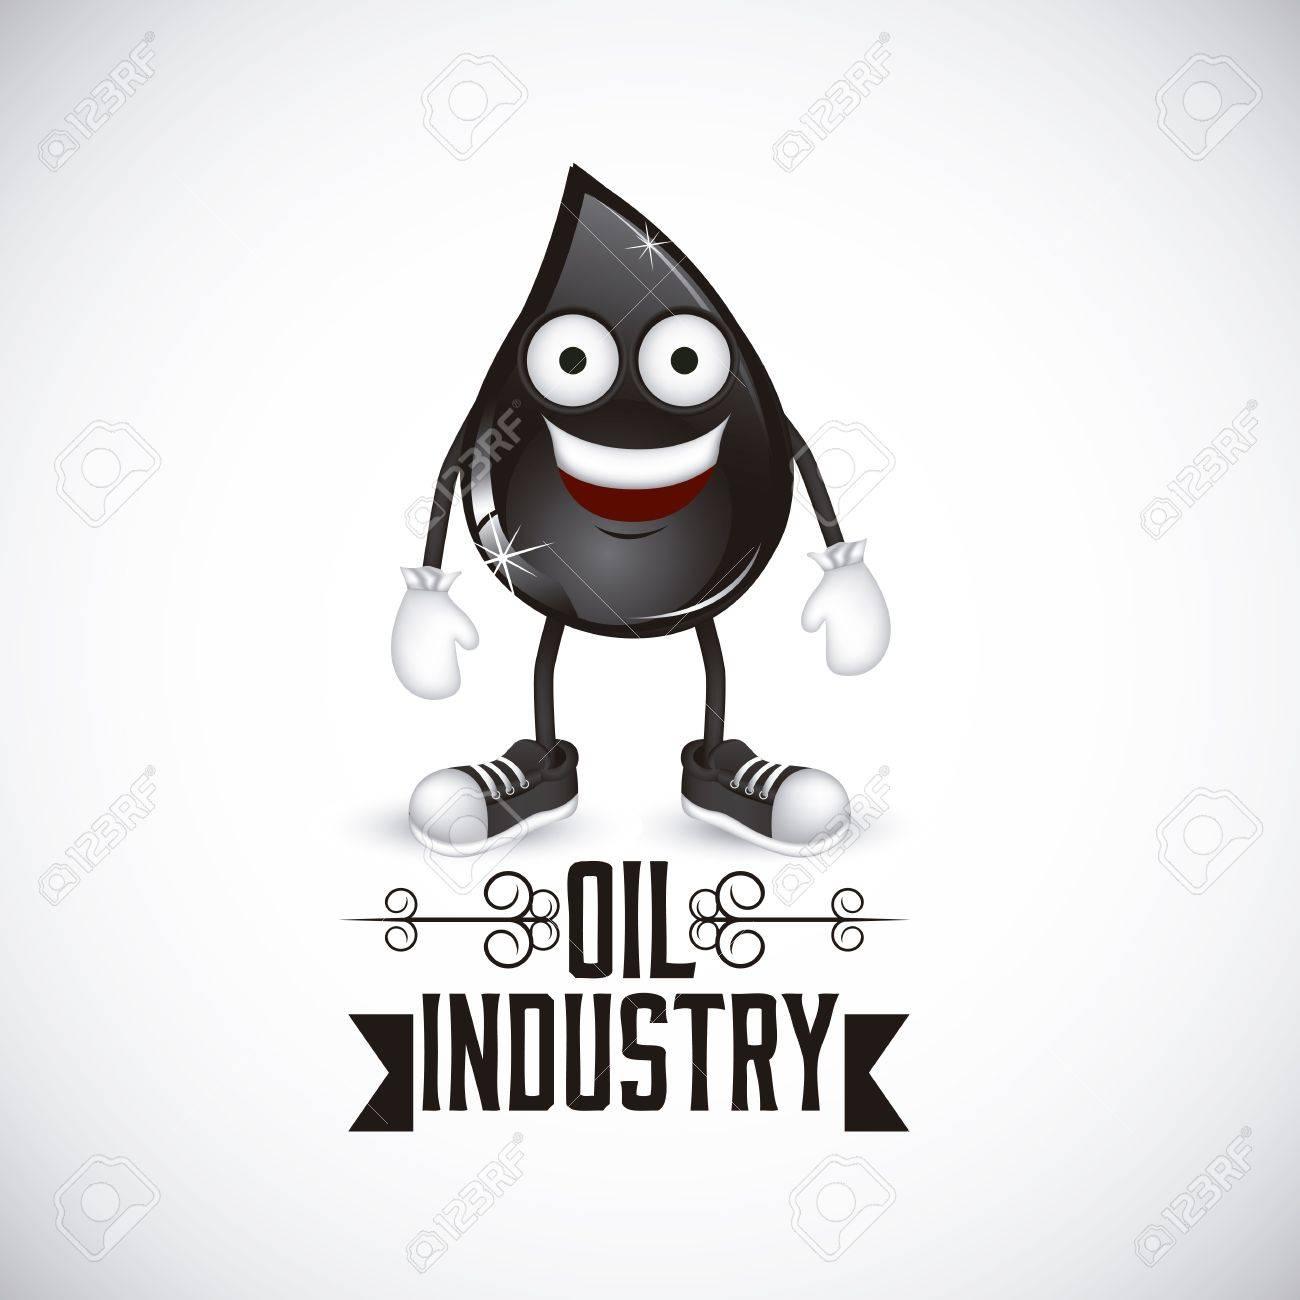 Illustration of the oil industry, oil cartoon character, illustration Stock Vector - 19673456